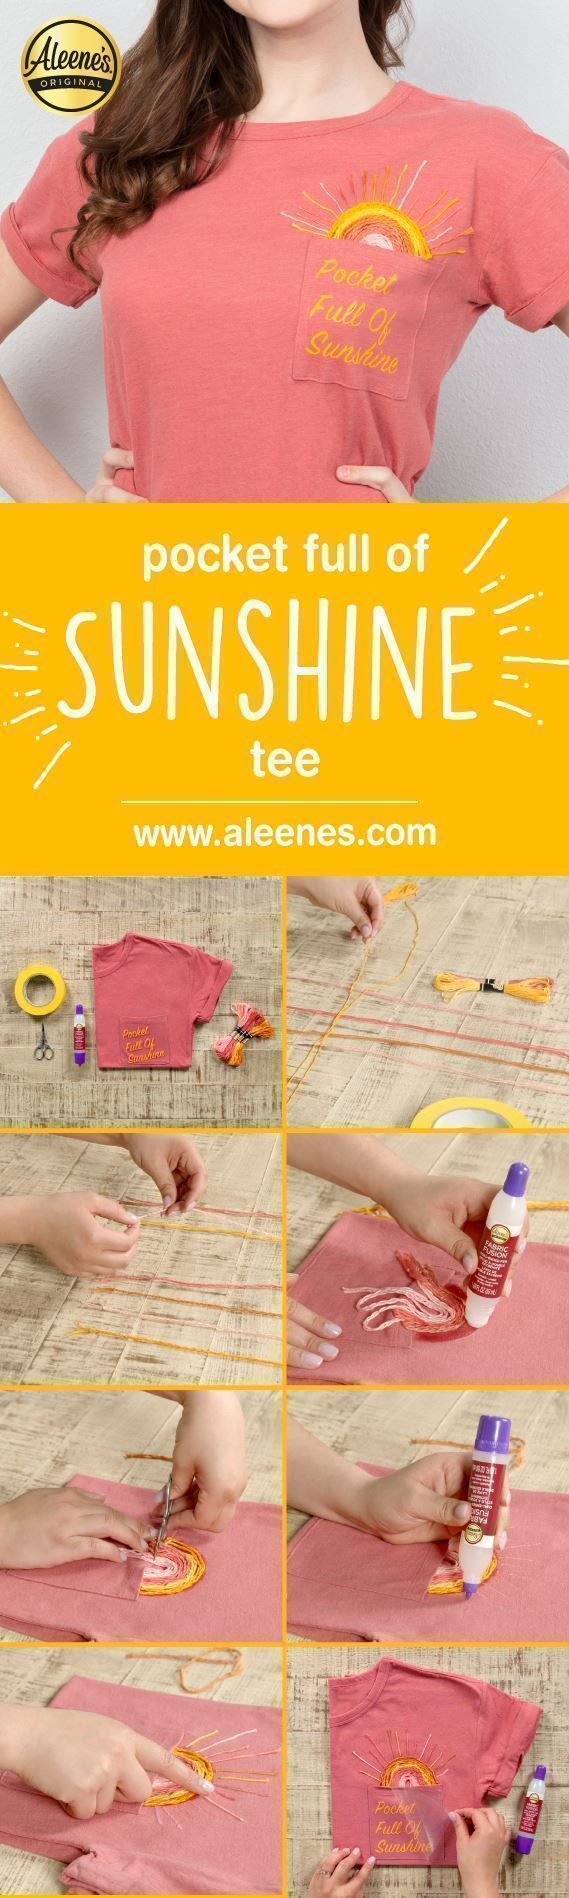 Aleene's Pocket Full of Sunshine Quote Art Tee